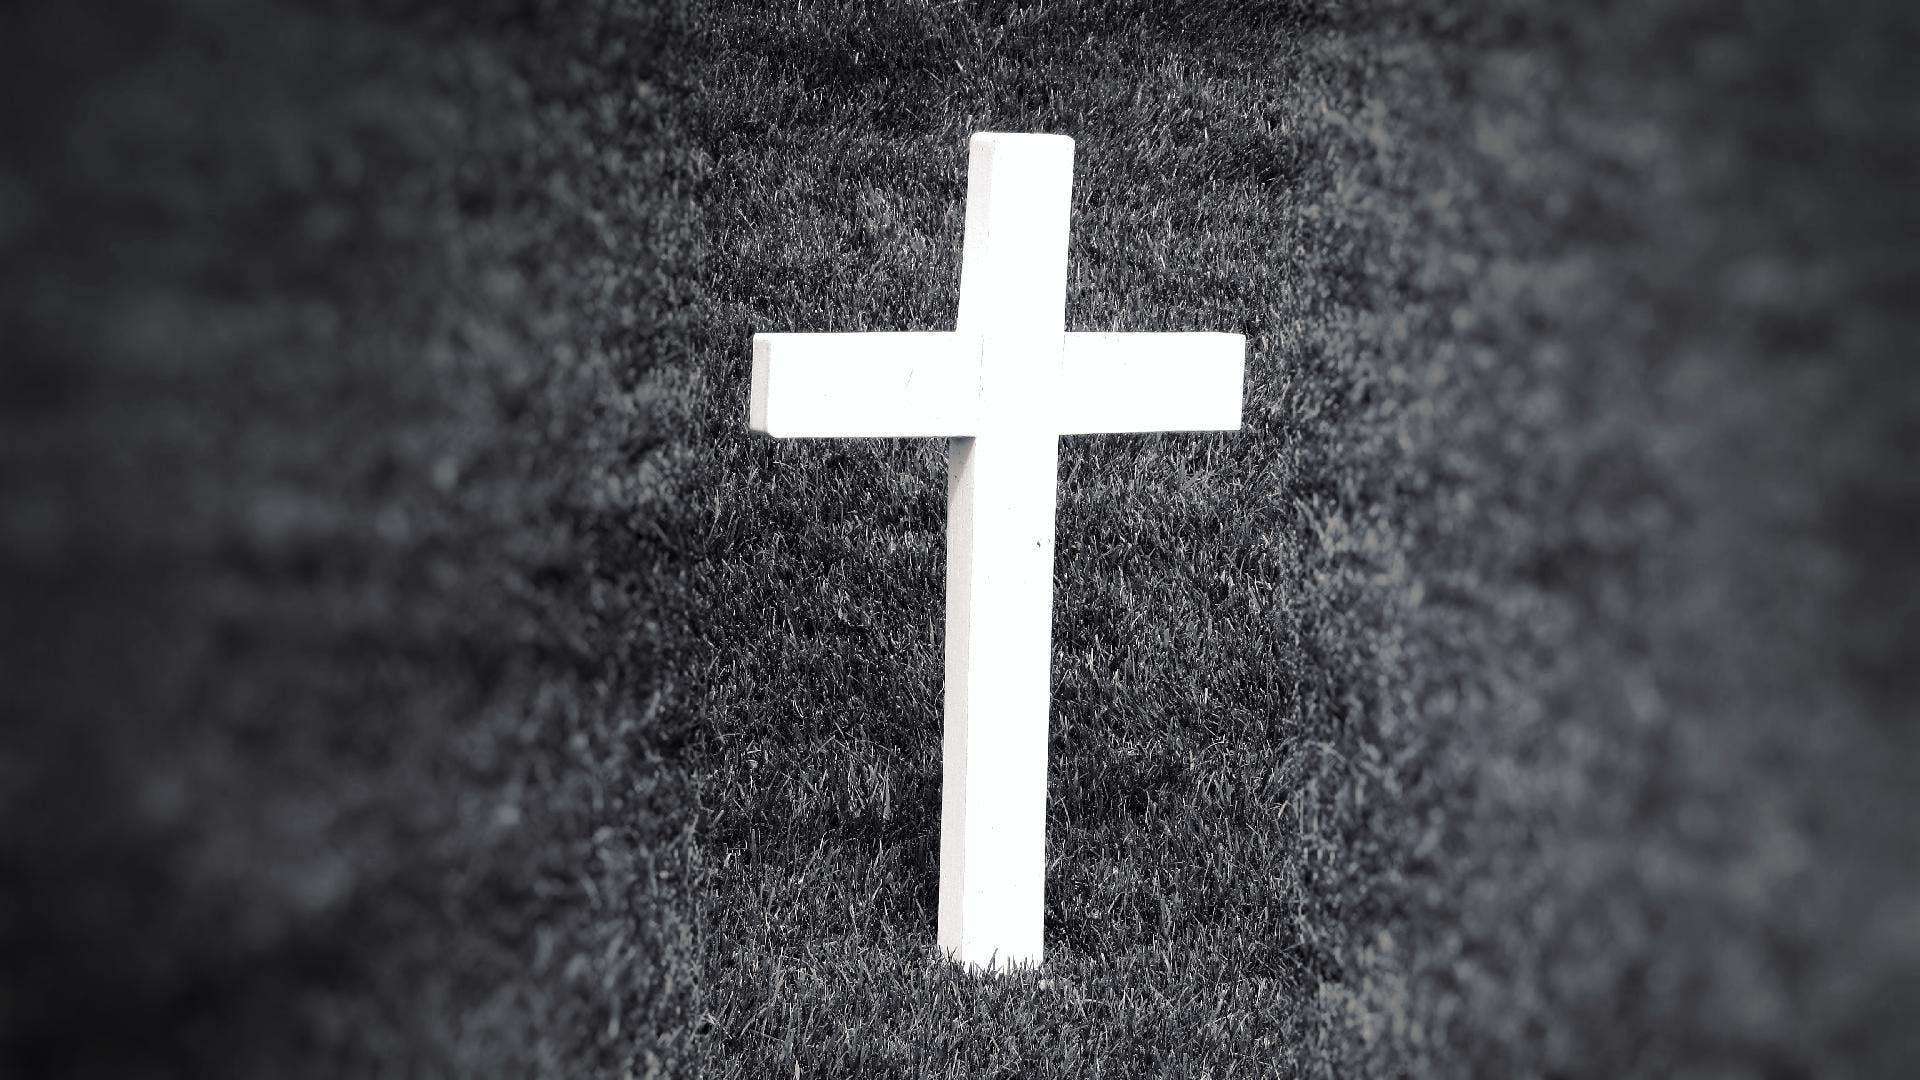 Free stock photo of black-and-white, grass, cross, symbol